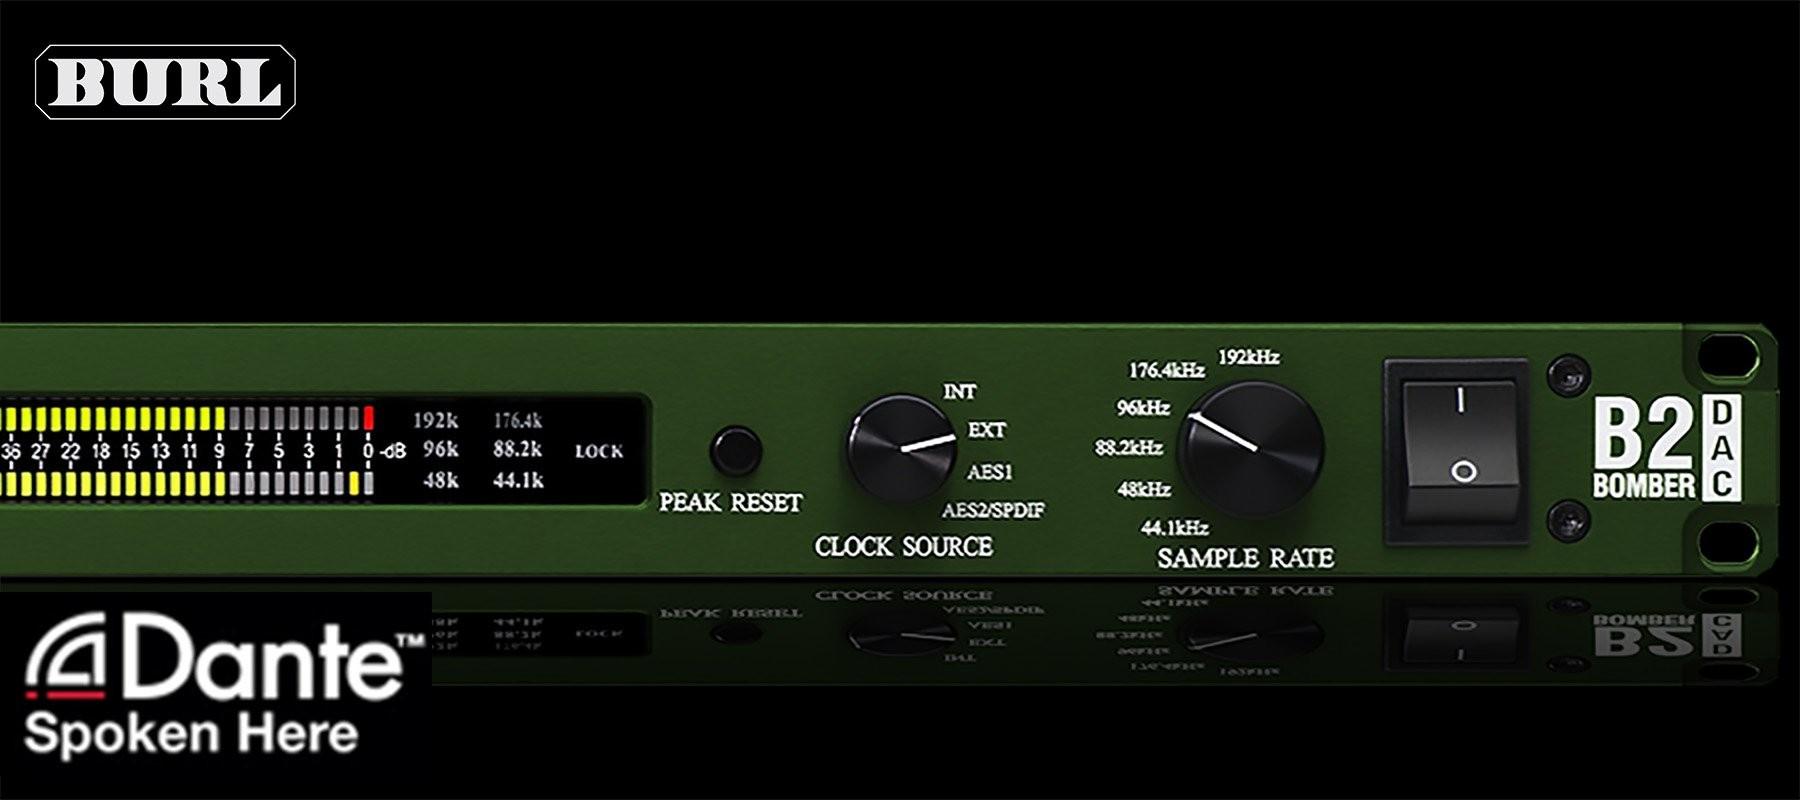 Burl Audio B2 Bomber DAC Dante Right